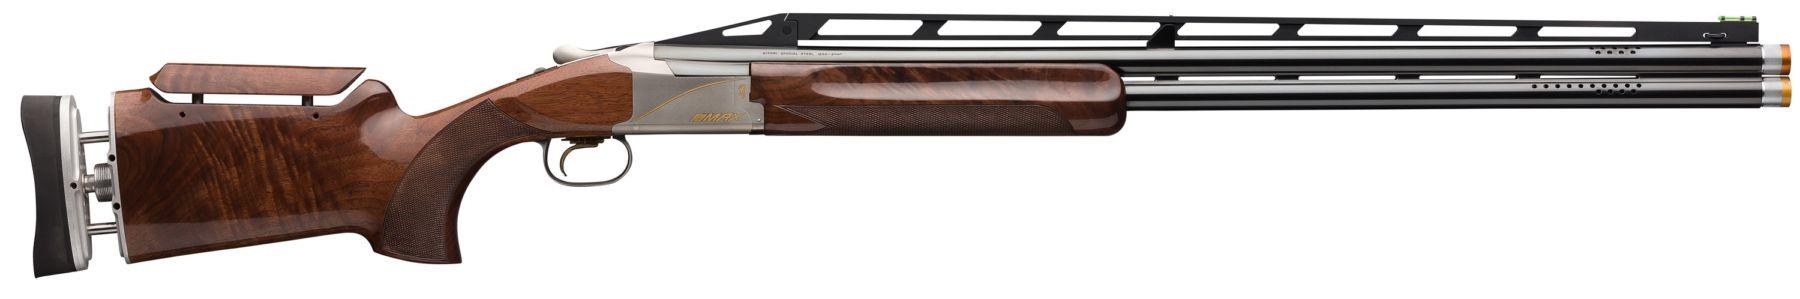 Browning Citori 725 Trap Max